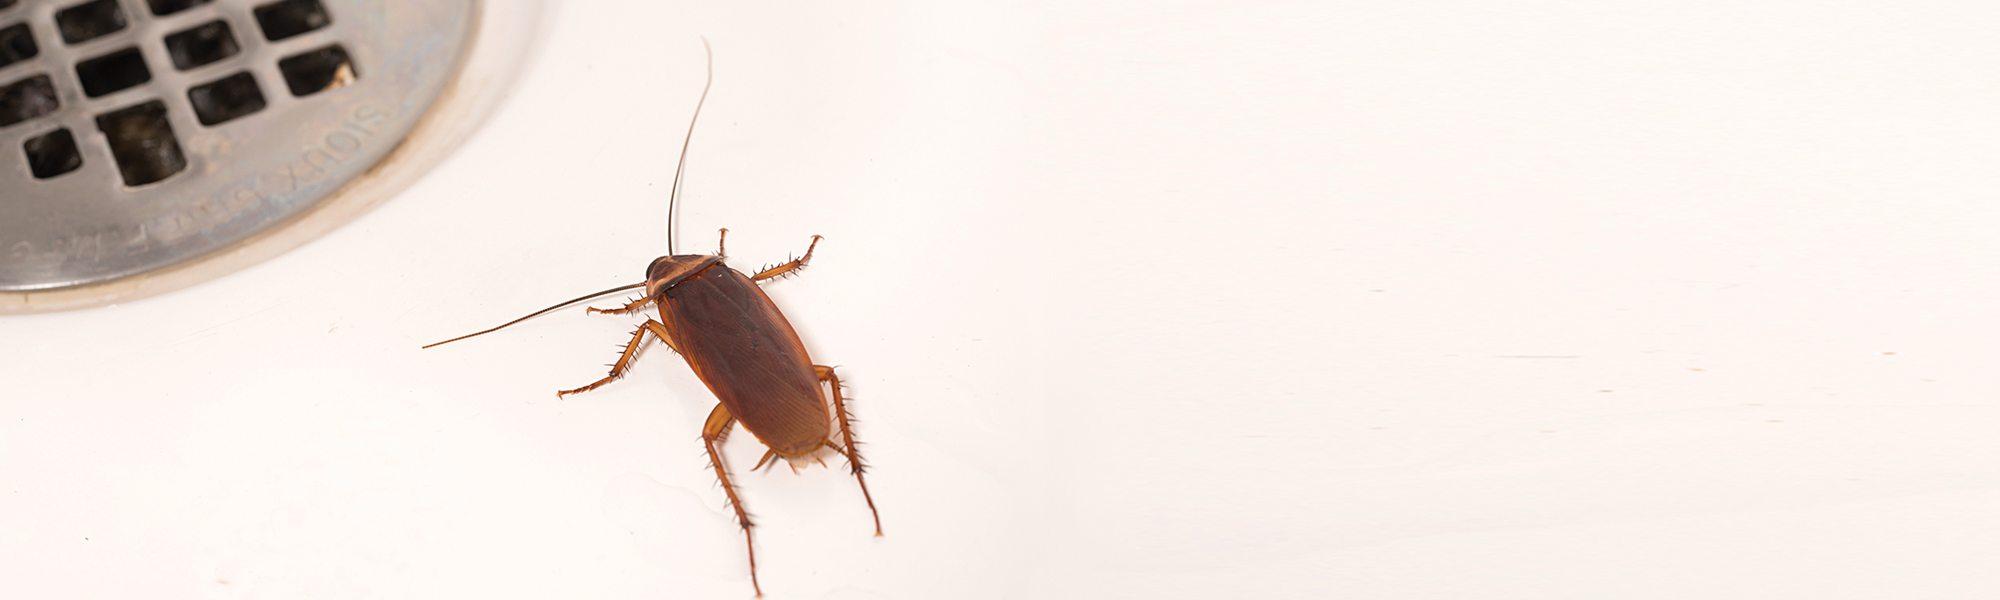 Cockroach-control-3.jpg